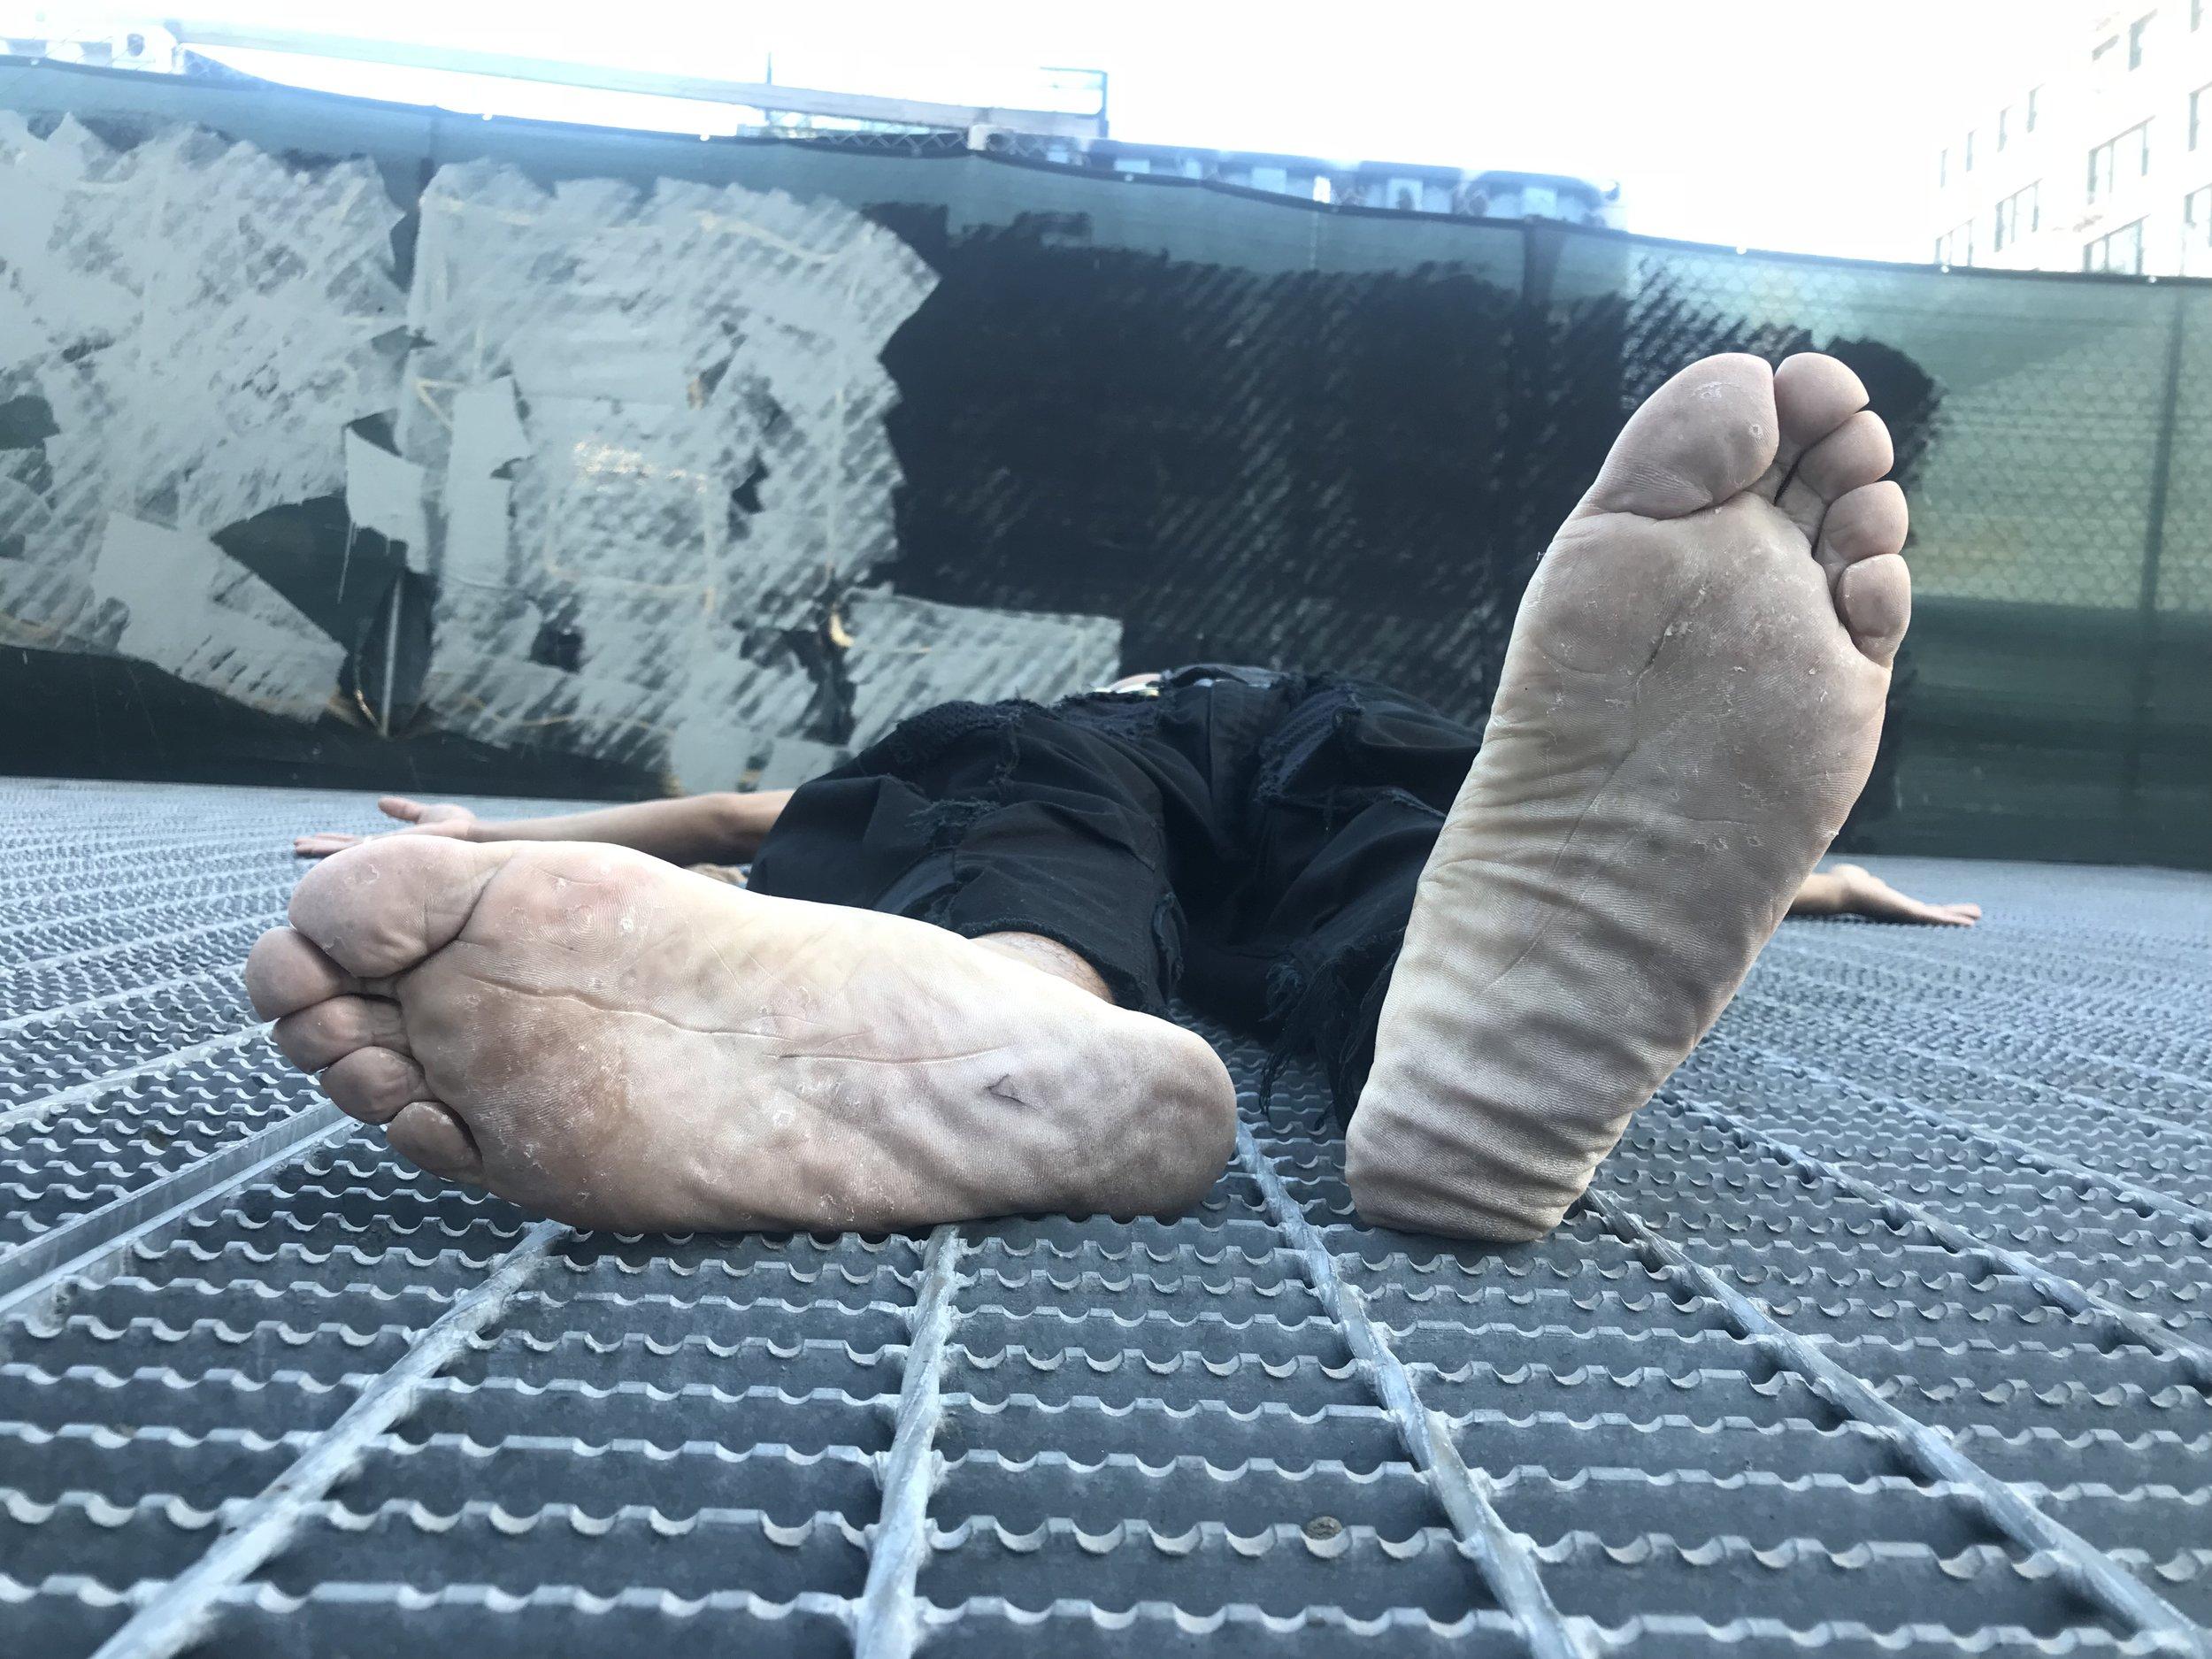 bare feet cracked